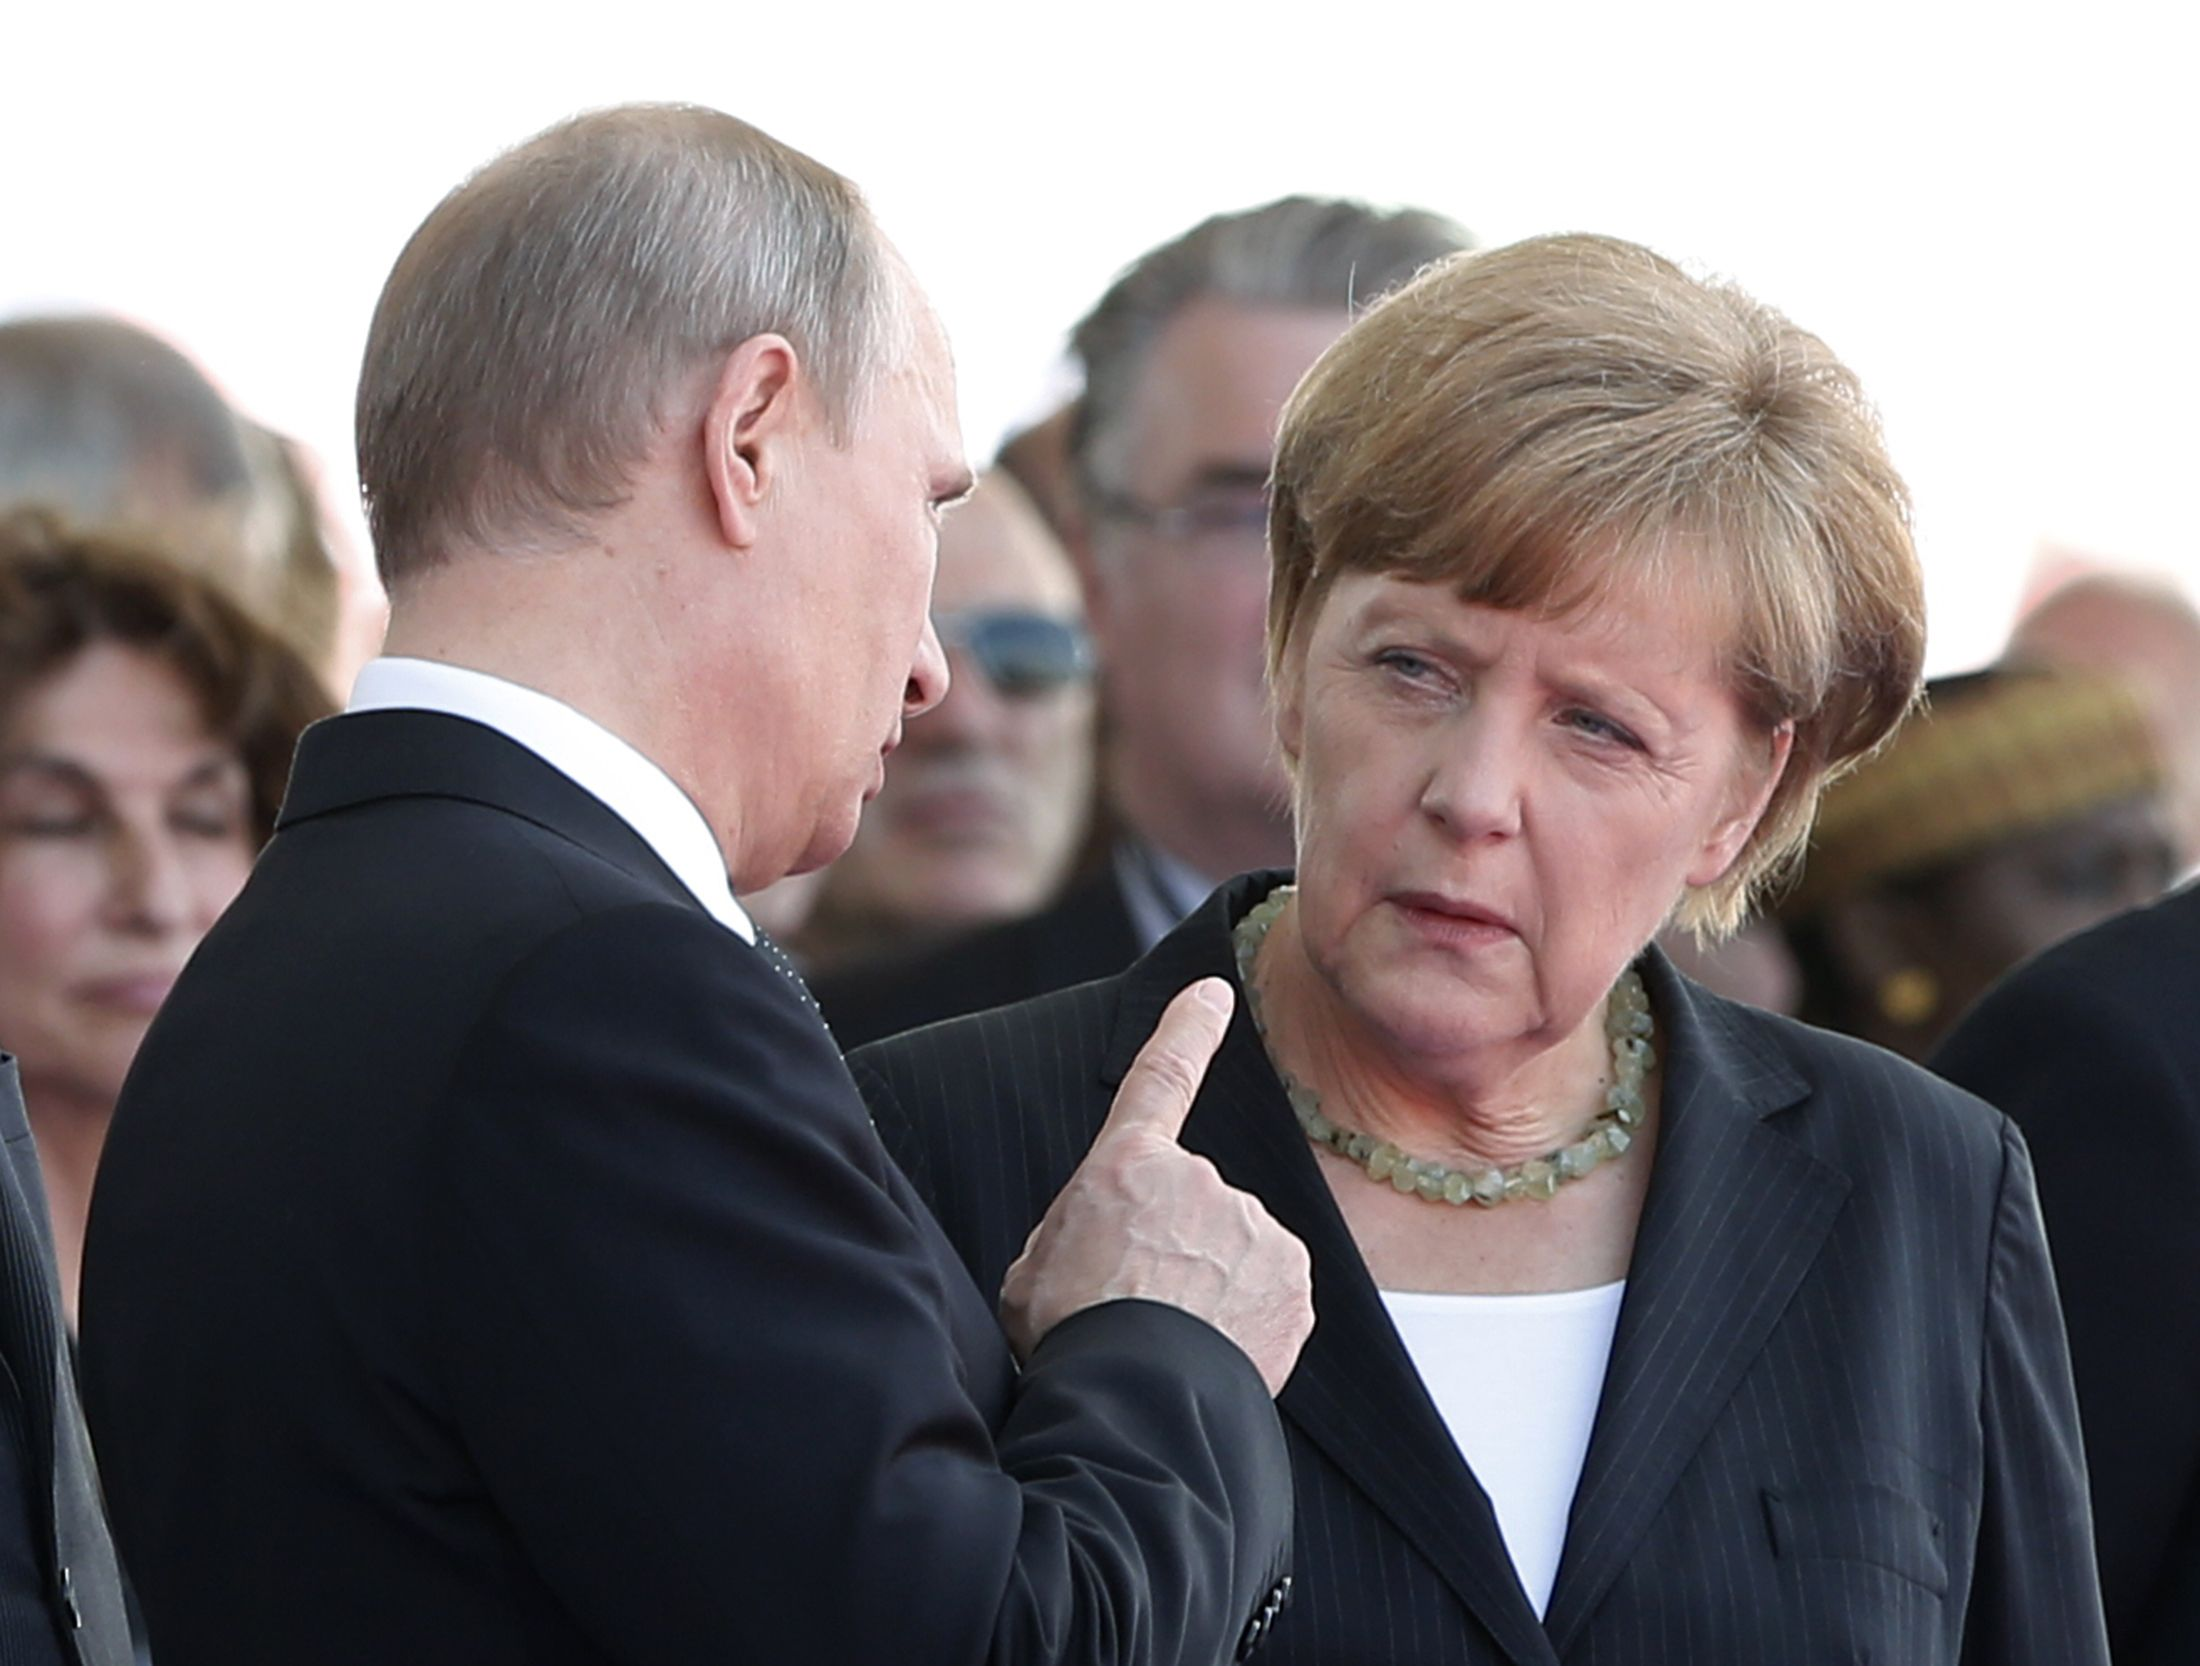 O Vladimir Poutin συνομιλεί με την Angela Merkel, ενόψει της ουκρανικής κρίσης, Ιούνιος 2014